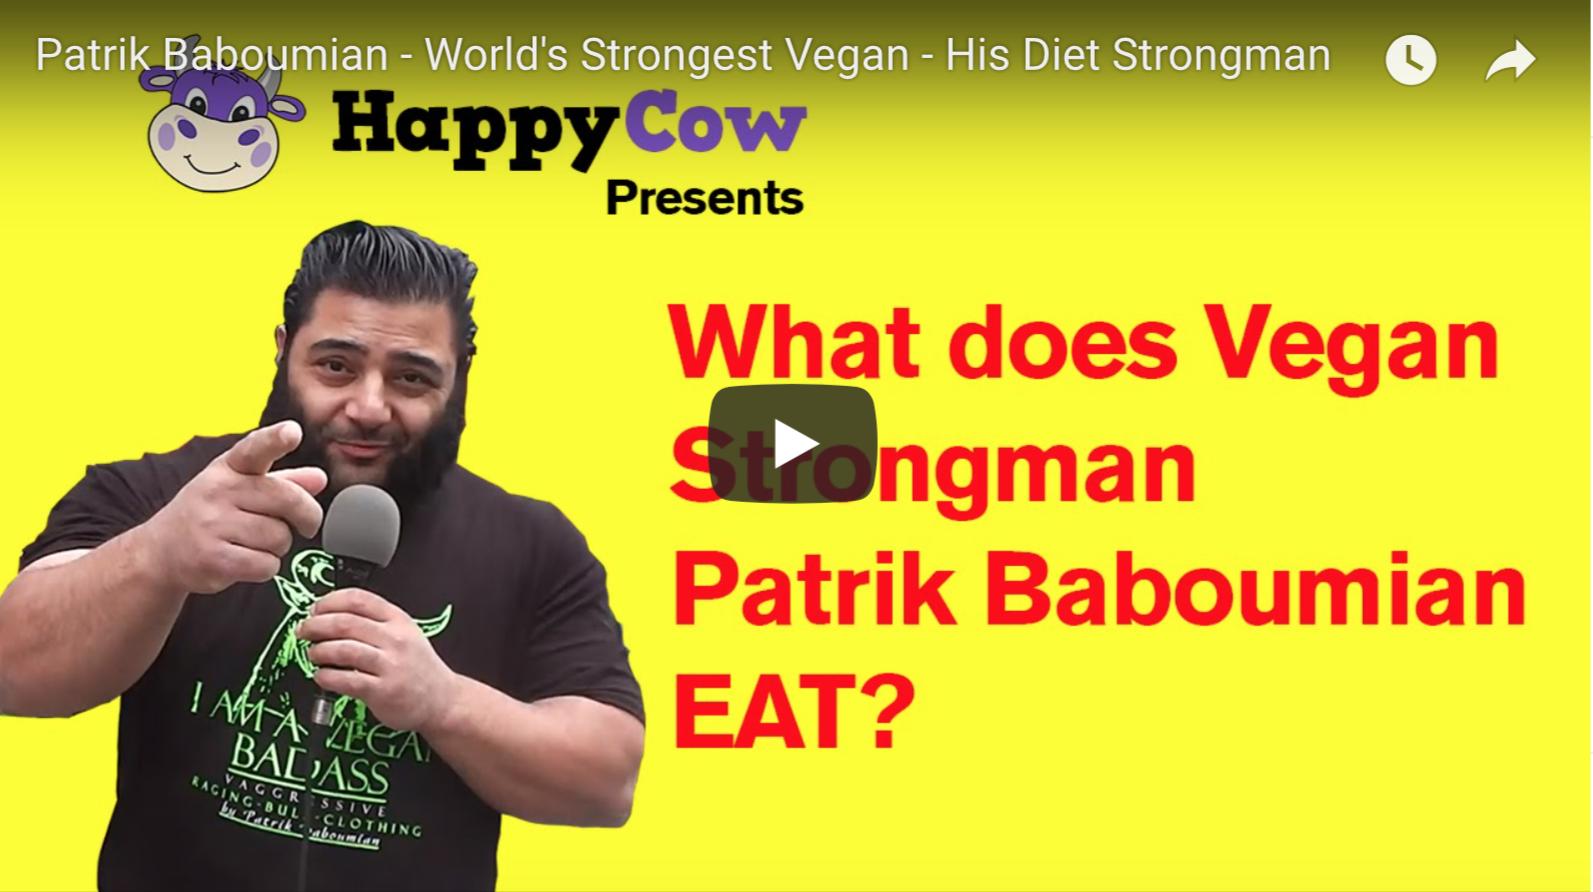 Patrik Baboumian - World's Strongest Vegan - His Diet Strongman | VeganFlix